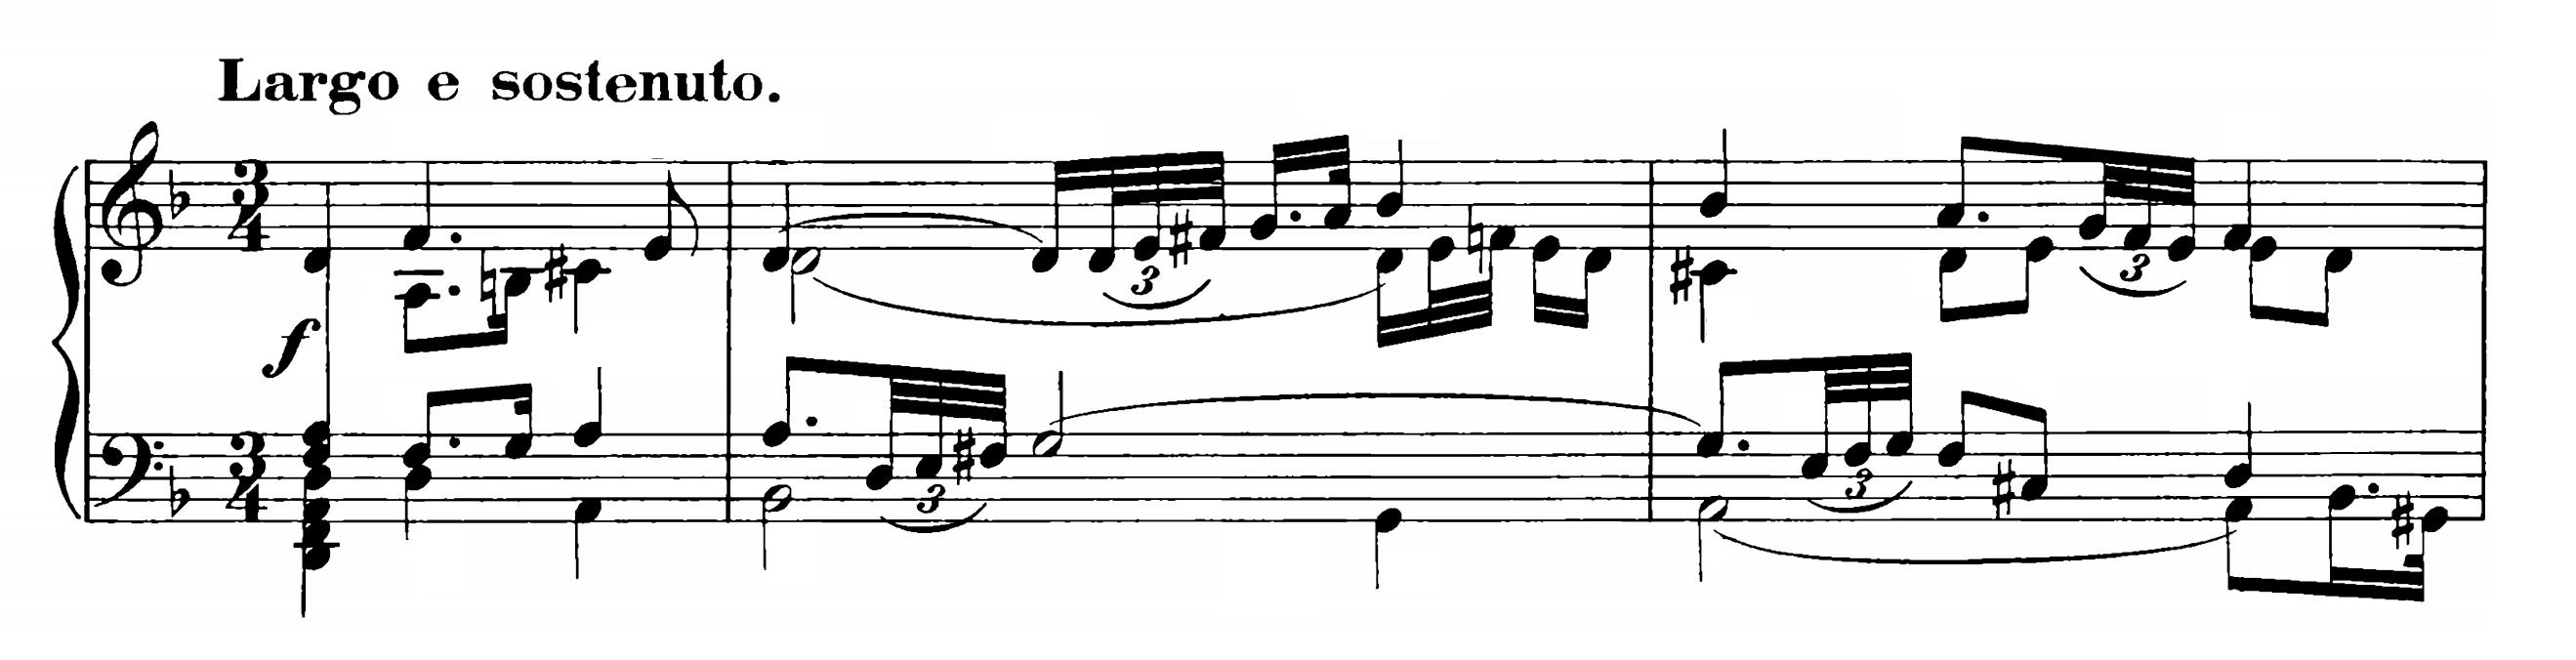 Haydn Piano Sonata in D Major Hob.XVI20 Analysis